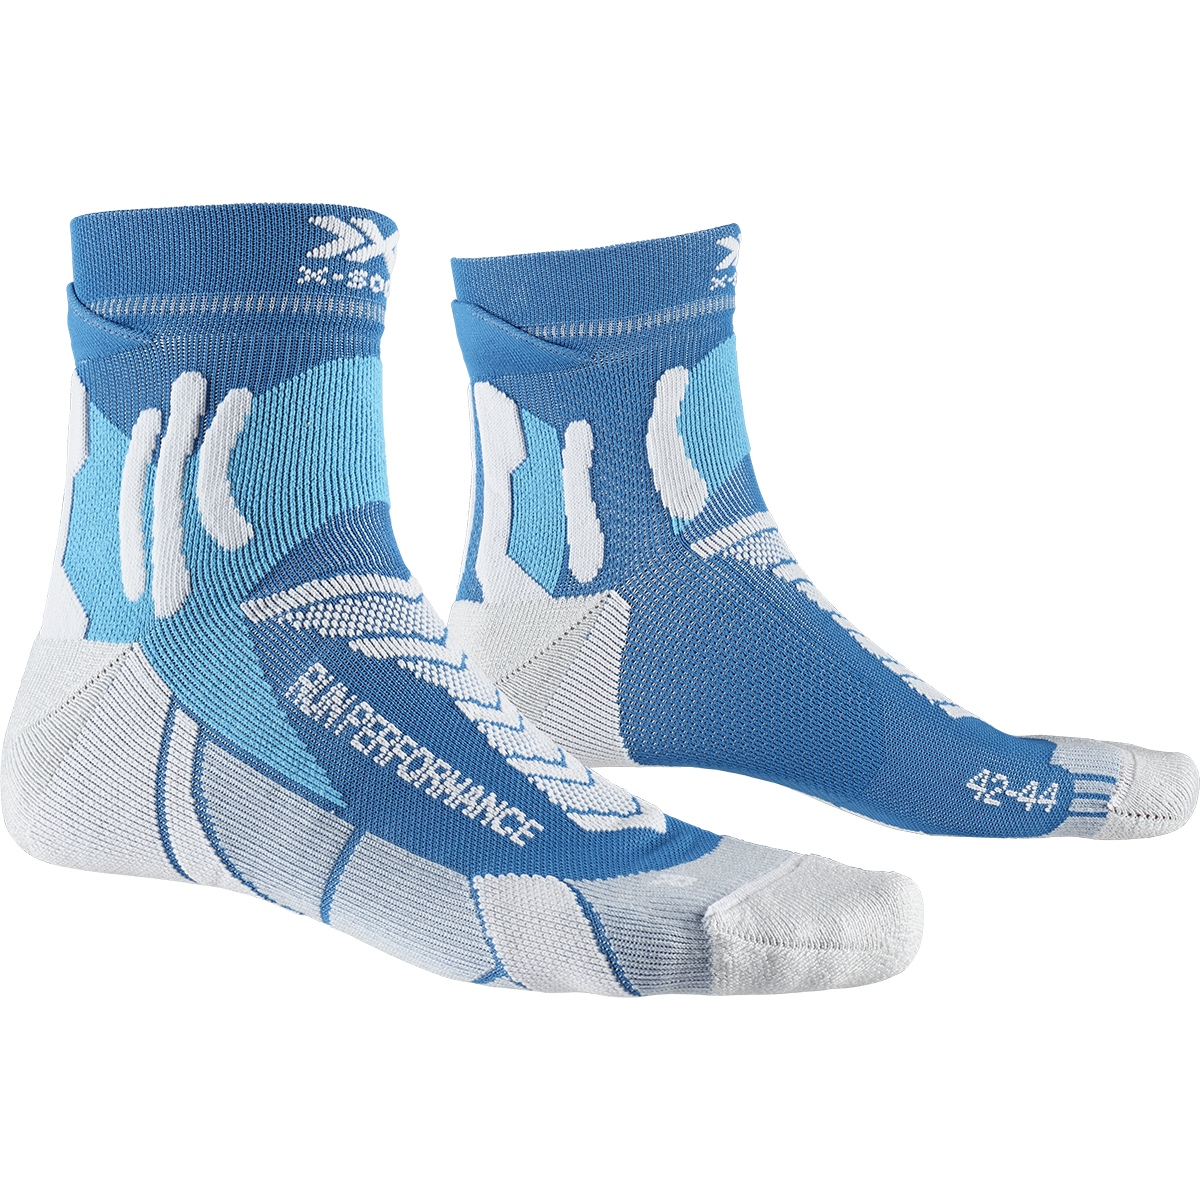 Foto de X-Socks Run Performance Calcetines de correr - teal blue/pearl grey